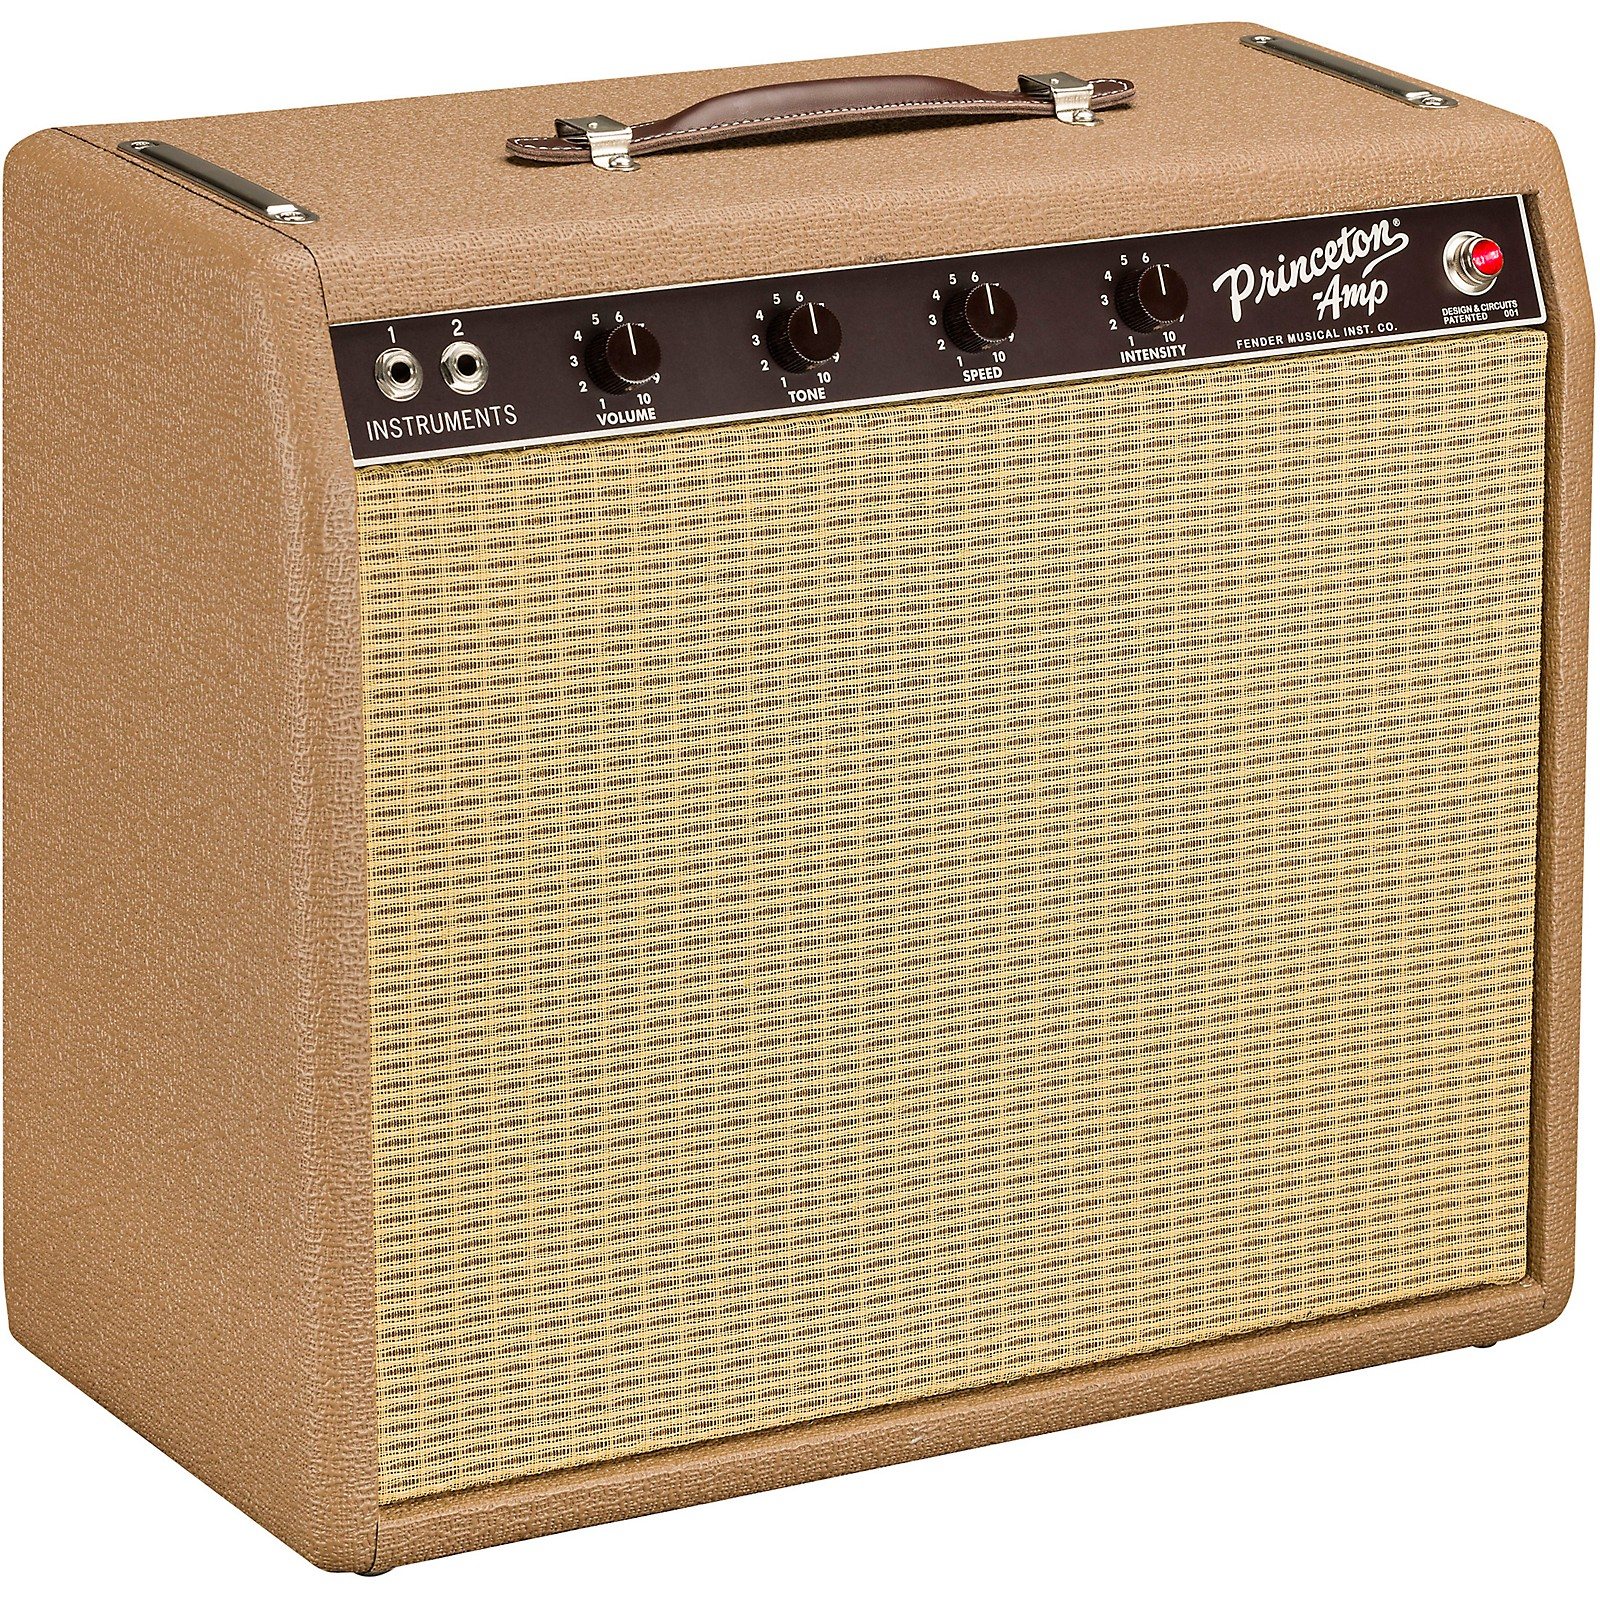 Open Box Fender '62 Princeton Chris Stapleton Edition 12W 1x12 Tube Guitar Combo Amp